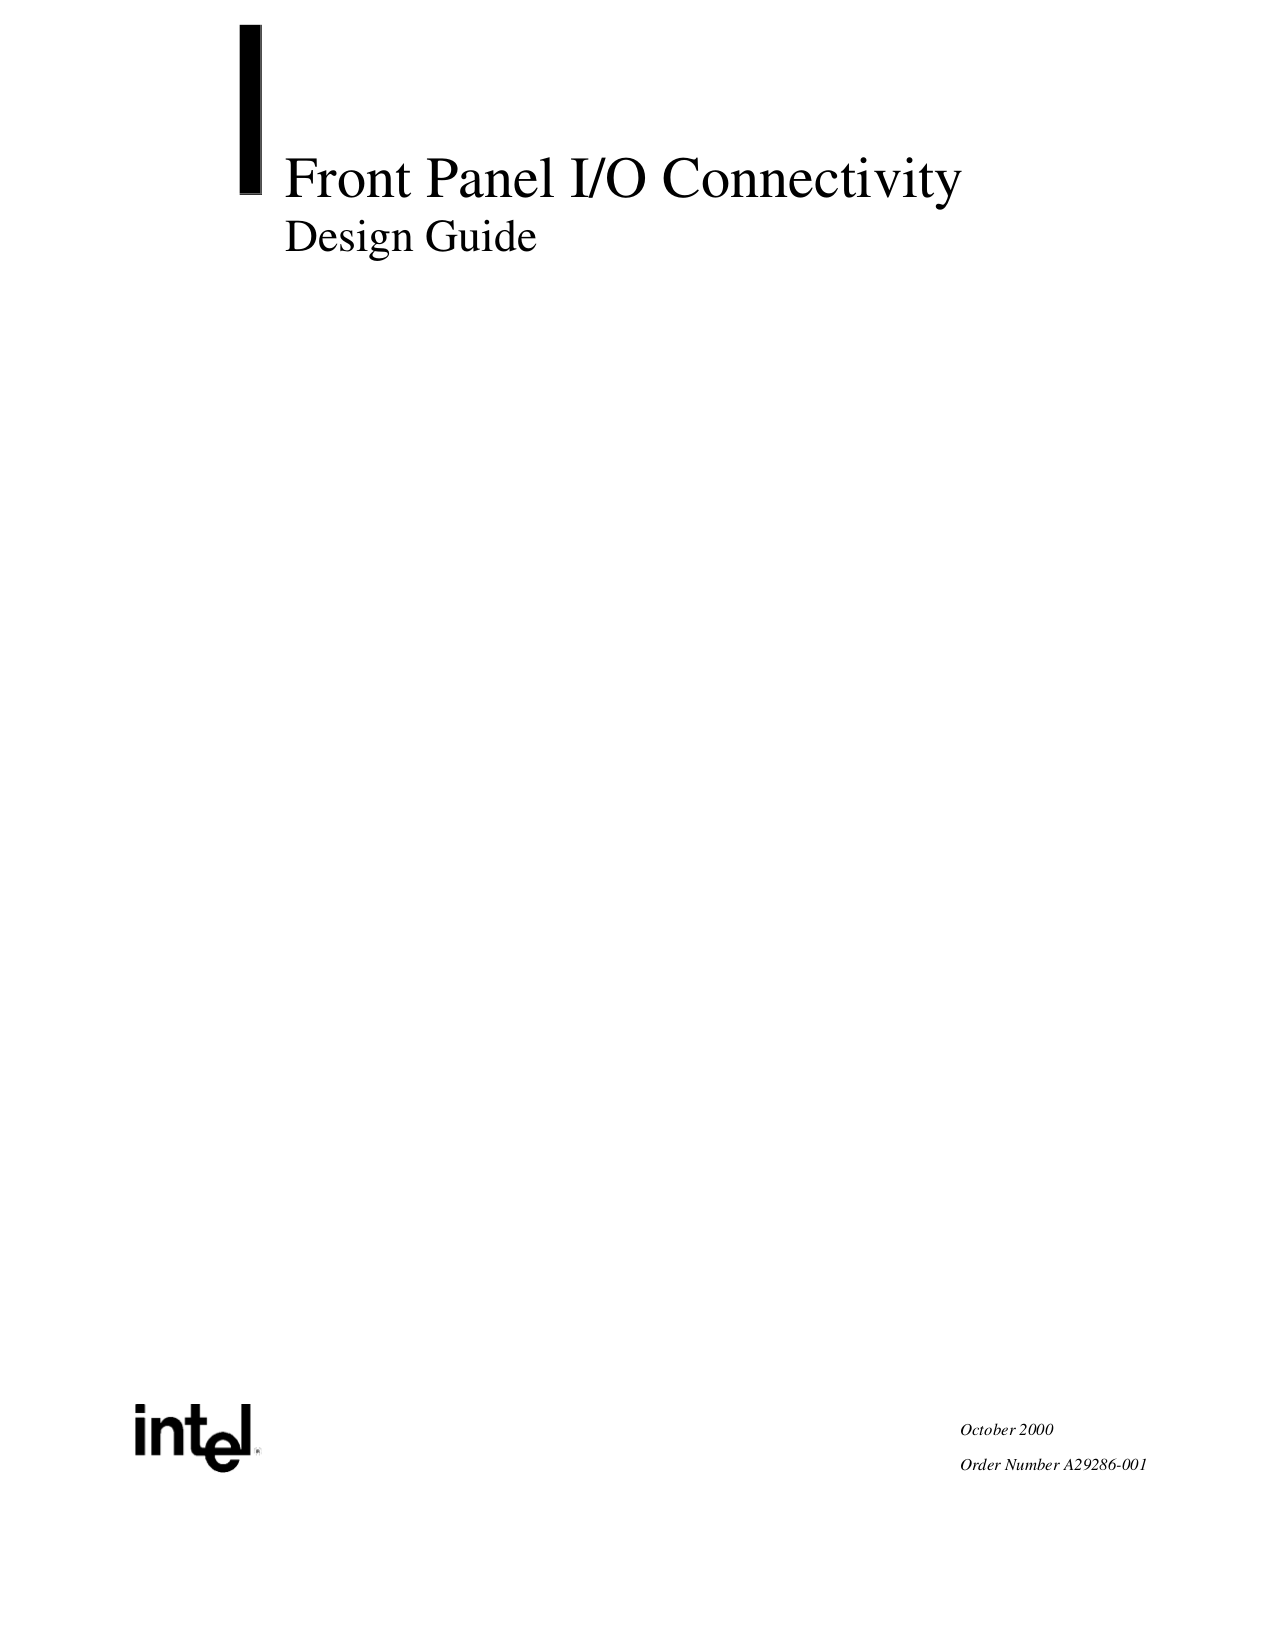 pdf for Lenovo Desktop ThinkCentre A55 9637 manual